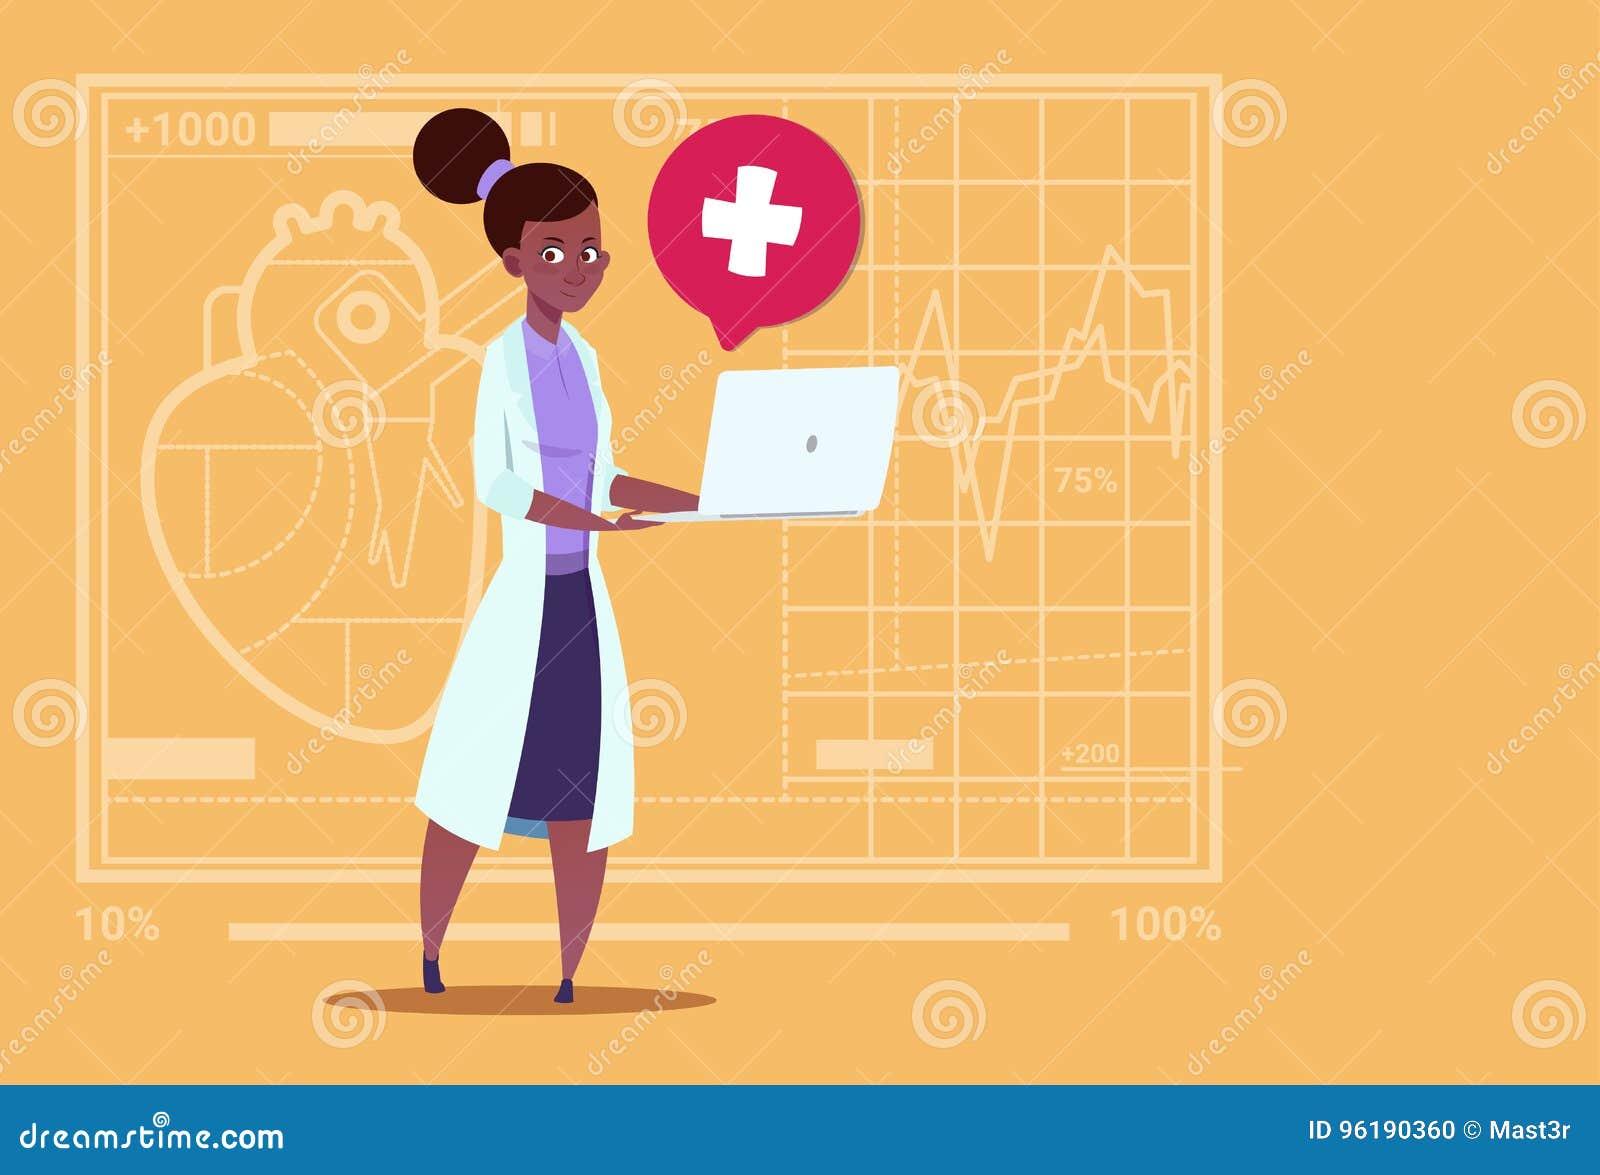 Ärztin-Hold Laptop Computer-on-line-Beratungs-medizinische Klinik-Afroamerikaner-Arbeitskraft-Krankenhaus